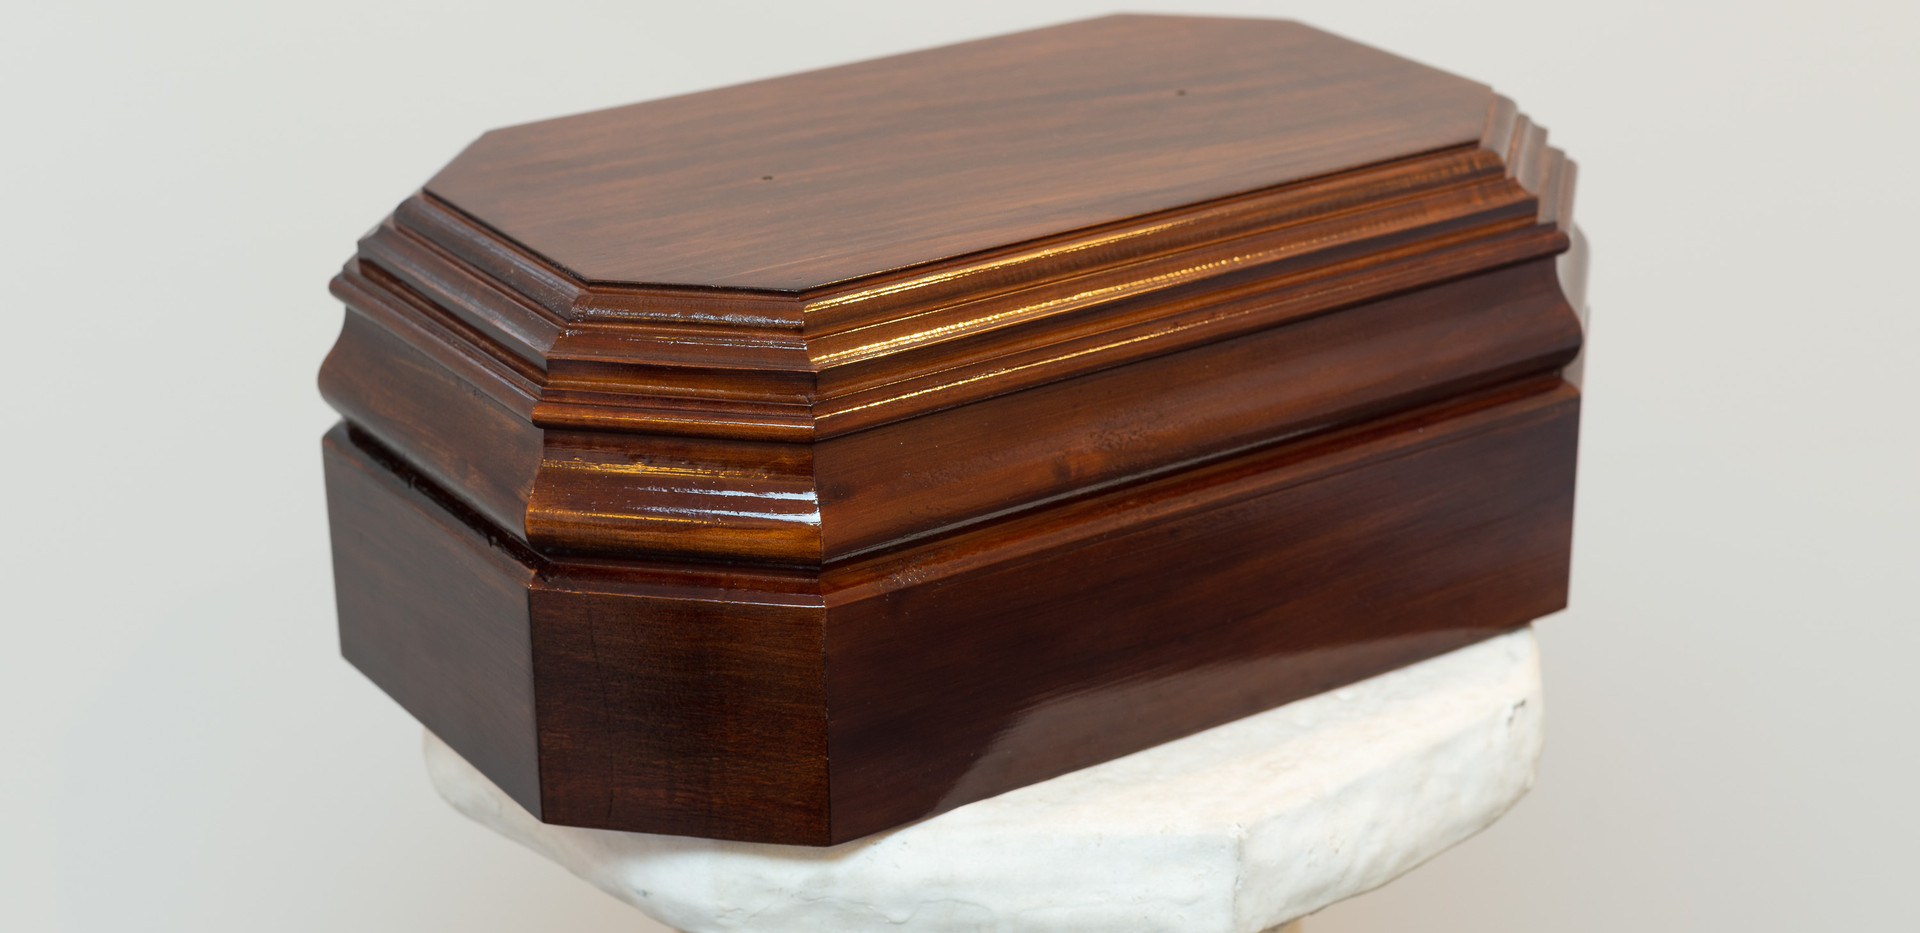 cremation urn 4 shone & shirley.jpg